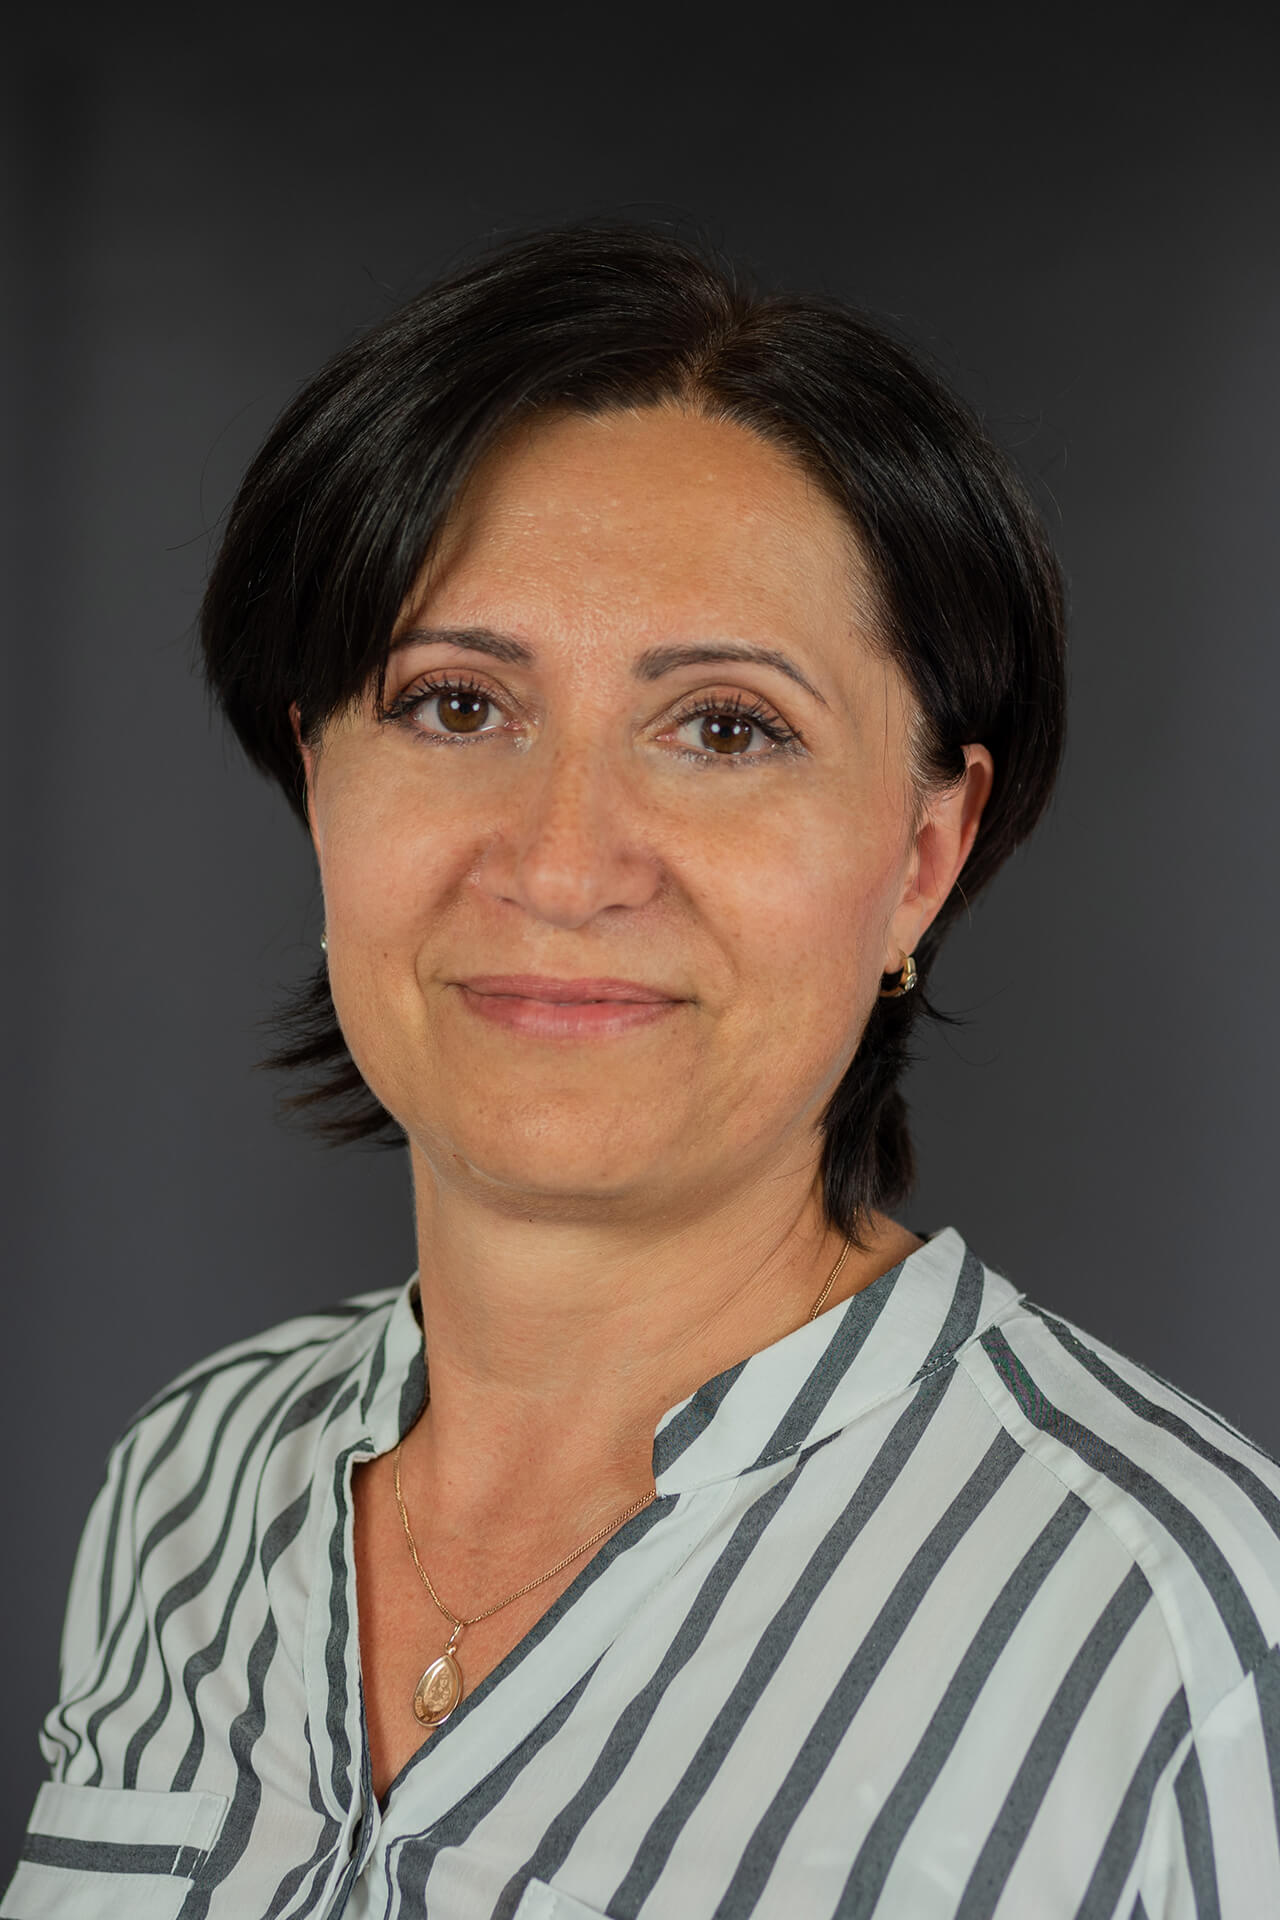 Natalia Meininger